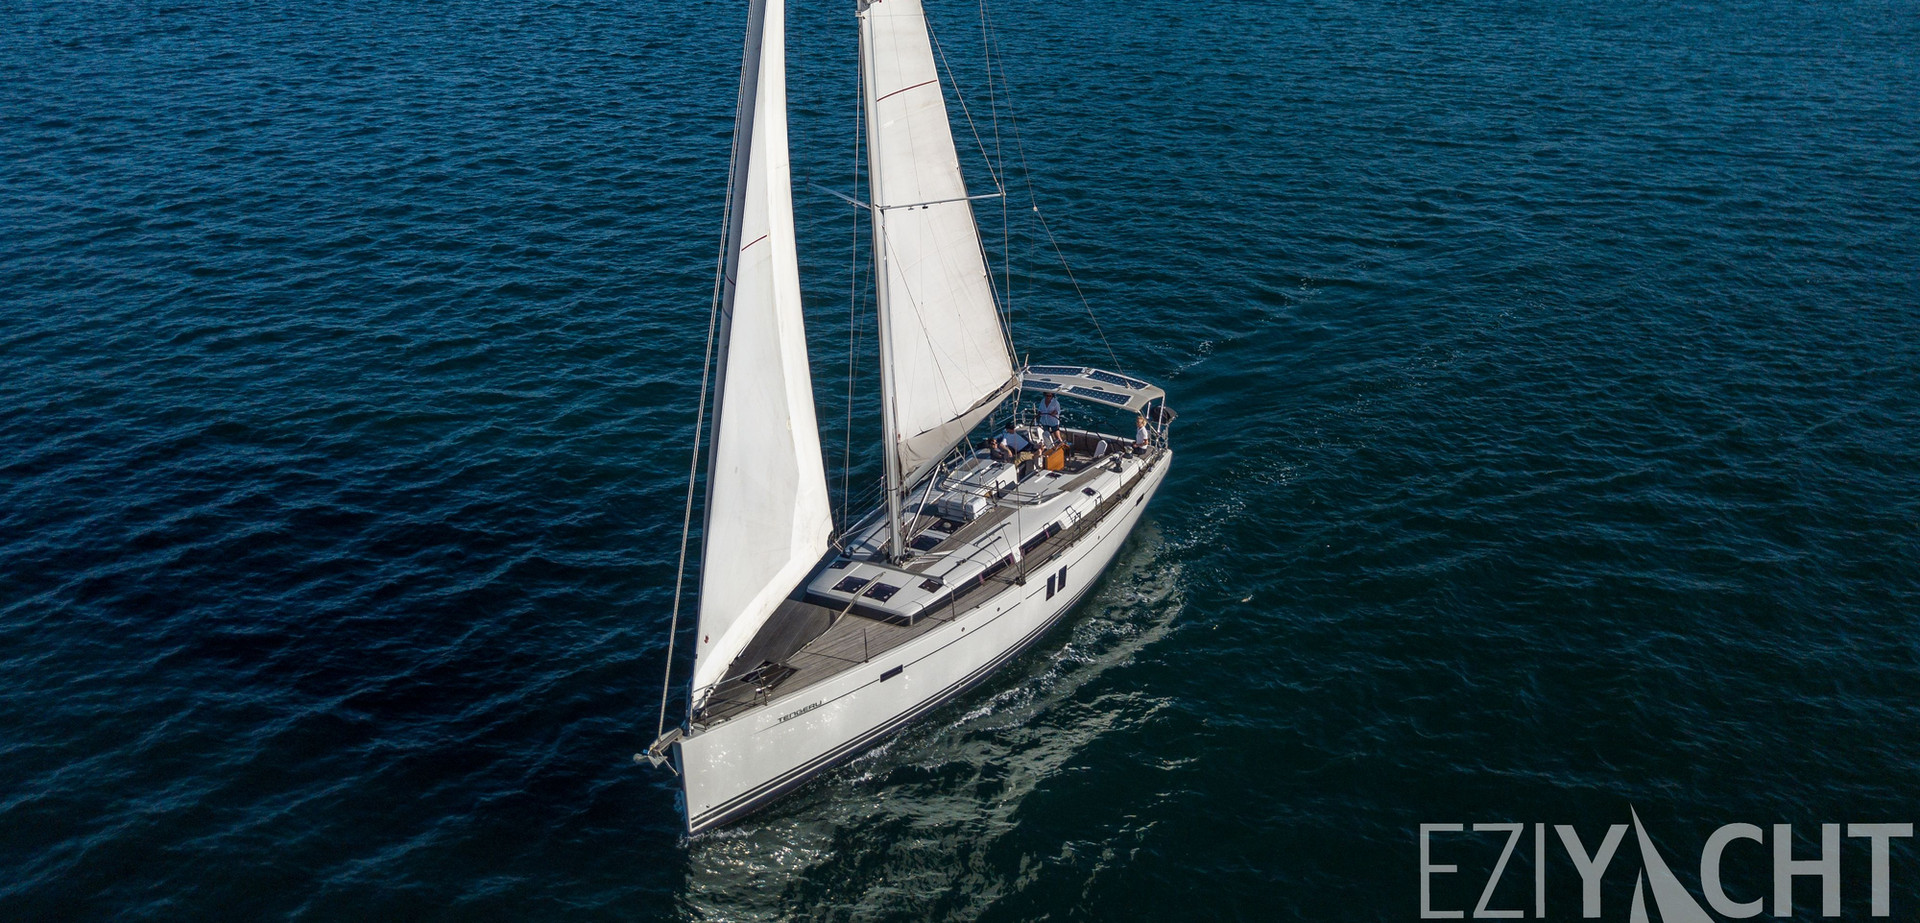 Hanse 495 for sale with EziYacht